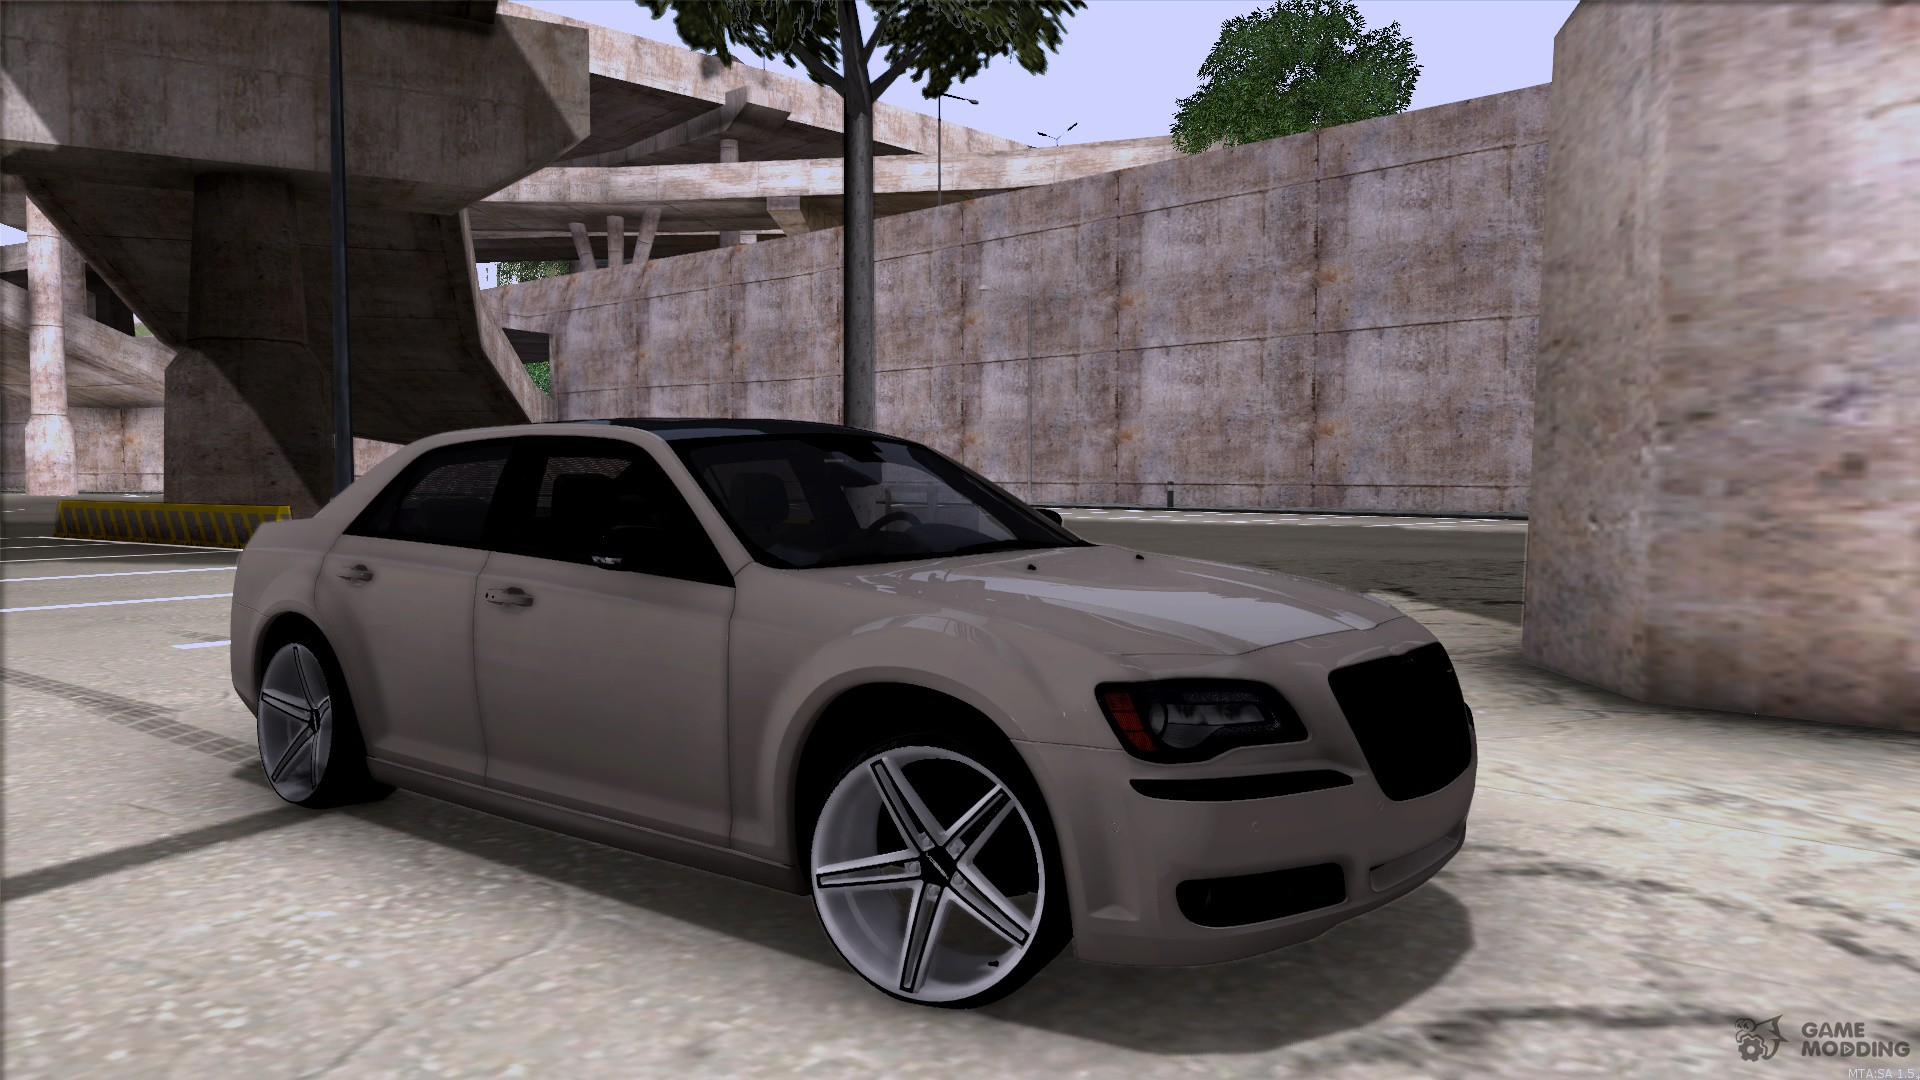 Chrysler for GTA San Andreas on gta 5 mitsubishi eclipse, gta 5 batmobile, gta 5 ferrari 250 gto, gta 5 mitsubishi galant, gta 5 volkswagen passat, gta 5 carbonizzare, gta 5 mitsubishi lancer, gta 5 eagle, gta 5 acura tl, gta 5 shelby mustang, gta 5 nissan 370z, gta 5 nissan gt-r, gta 5 holden commodore, gta 5 porsche 918, gta 5 jaguar x-type, gta 5 chevy malibu, gta 5 nissan 240sx, gta 5 ford bronco, gta 5 hennessey venom gt, gta 5 acura nsx,